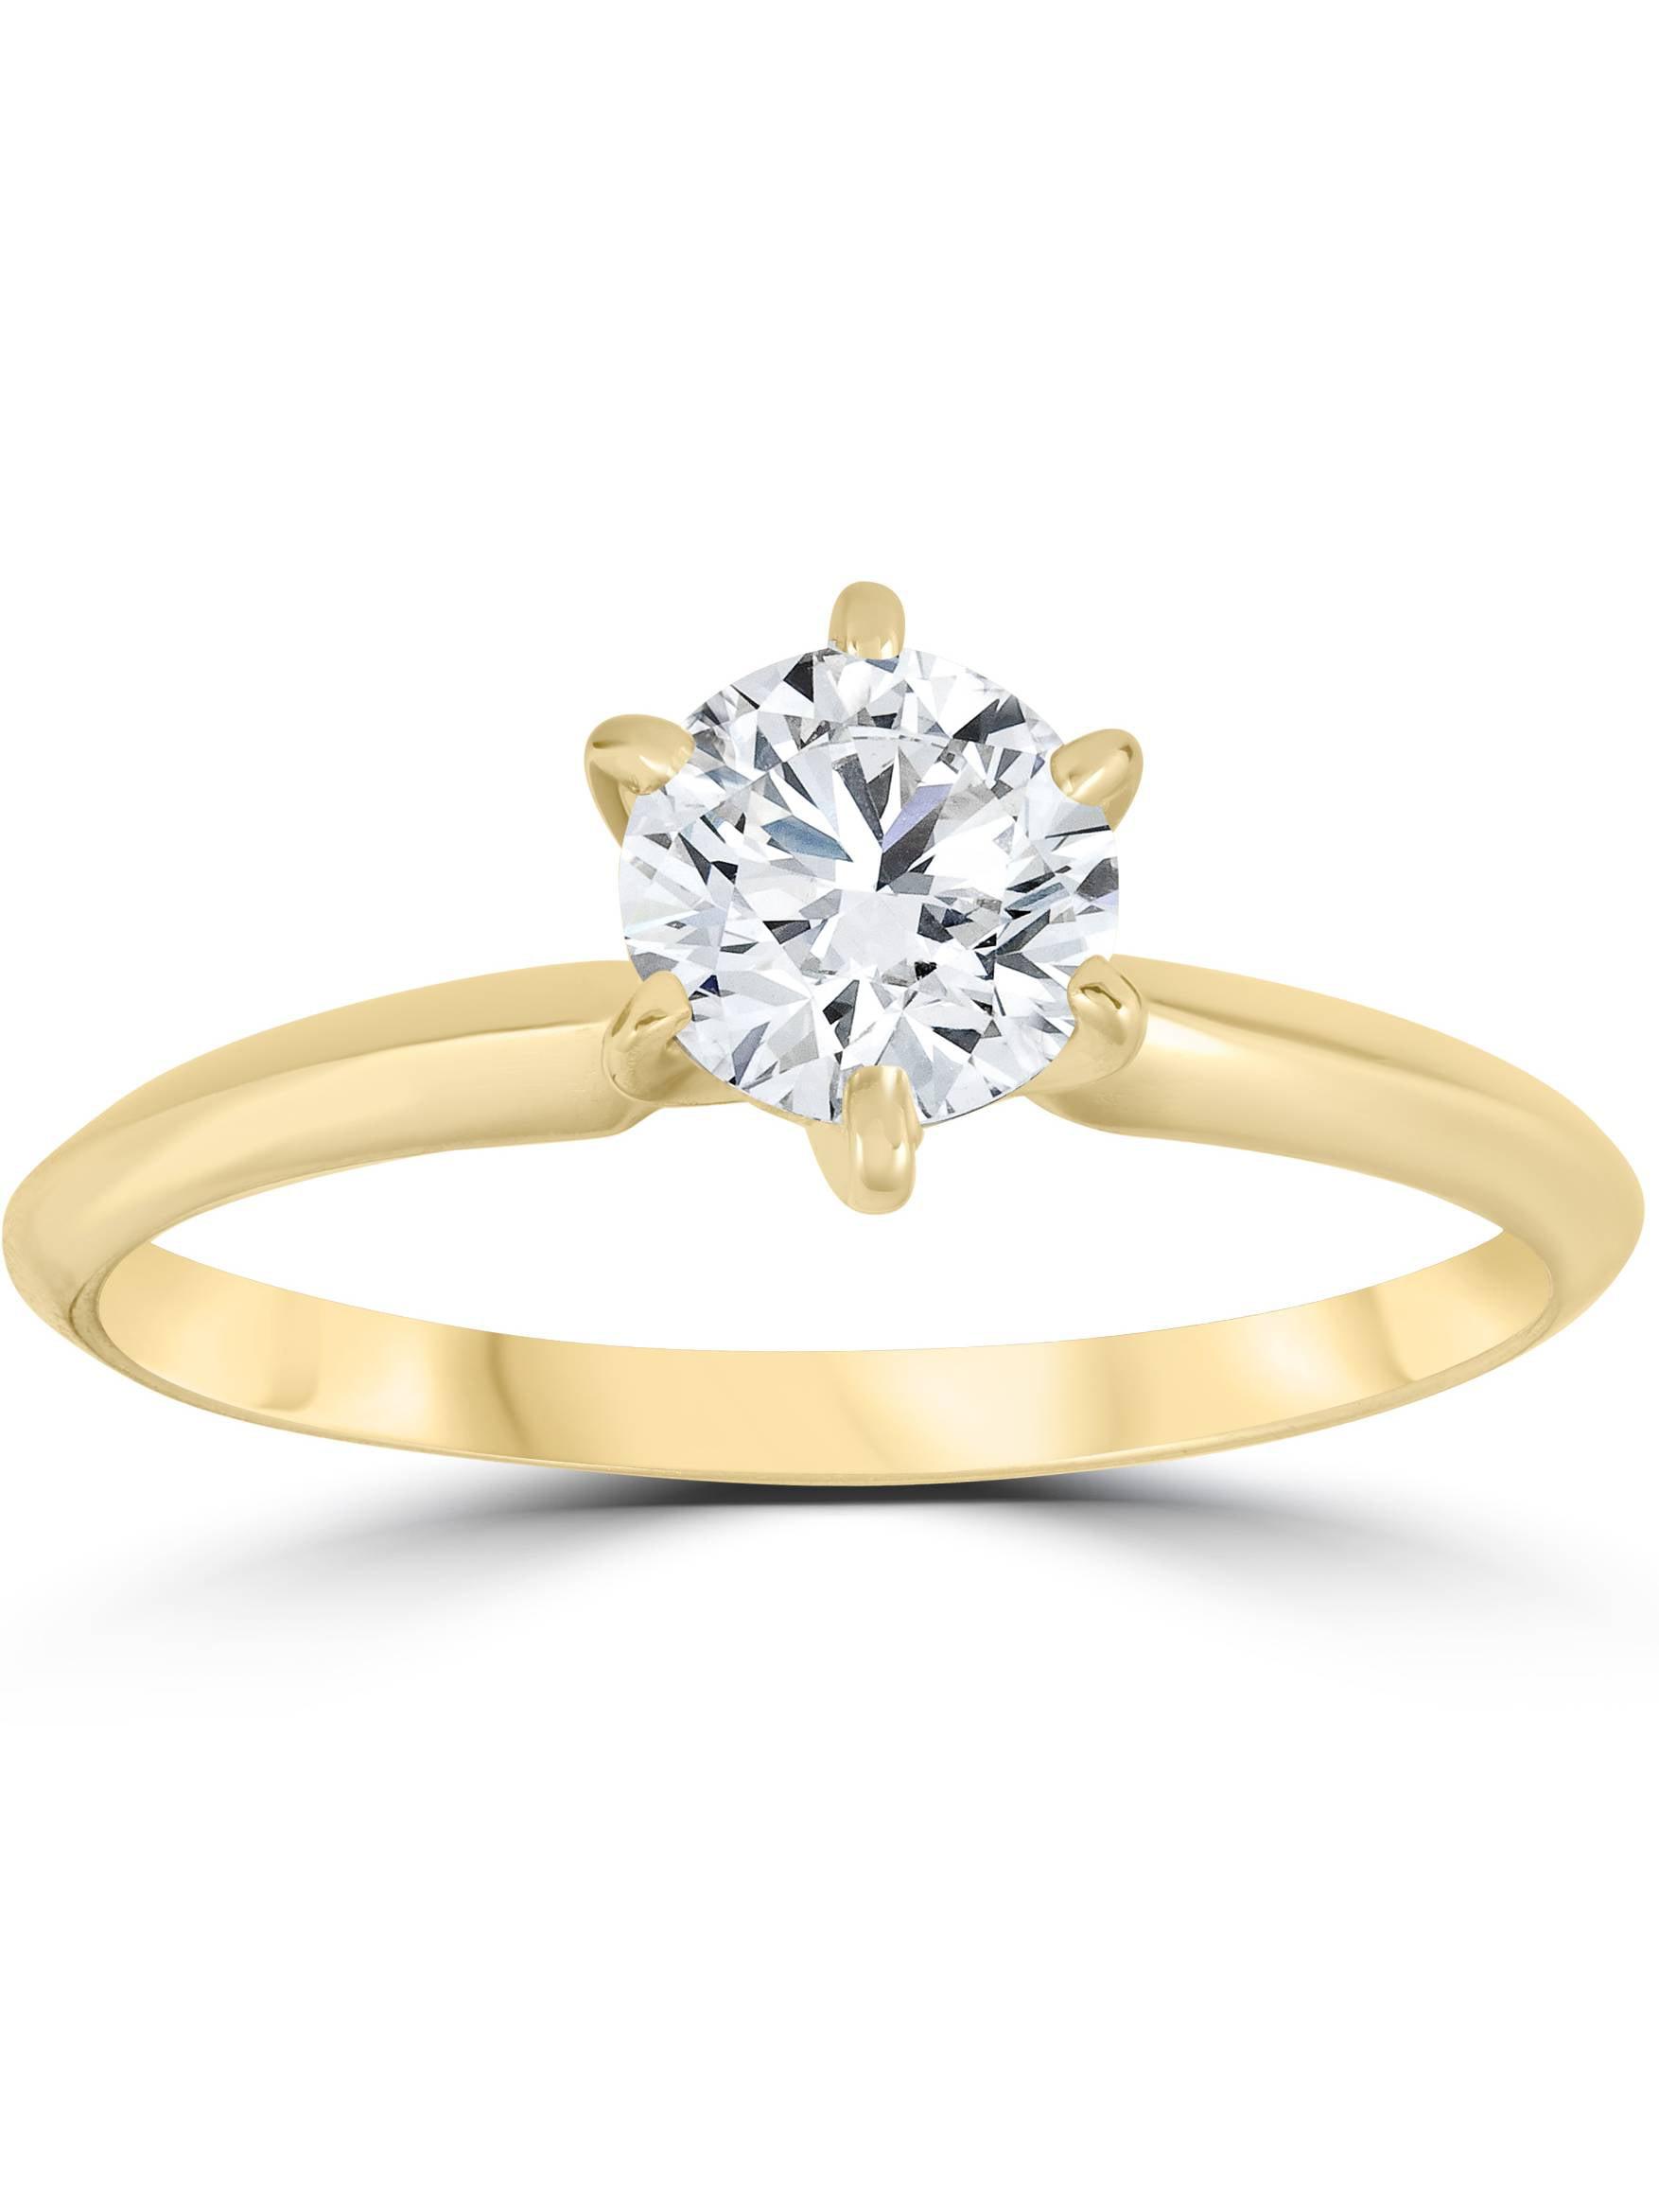 14k Yellow Gold 3/4ct Round Solitaire Diamond Engagement Ring Jewelry Brilliant